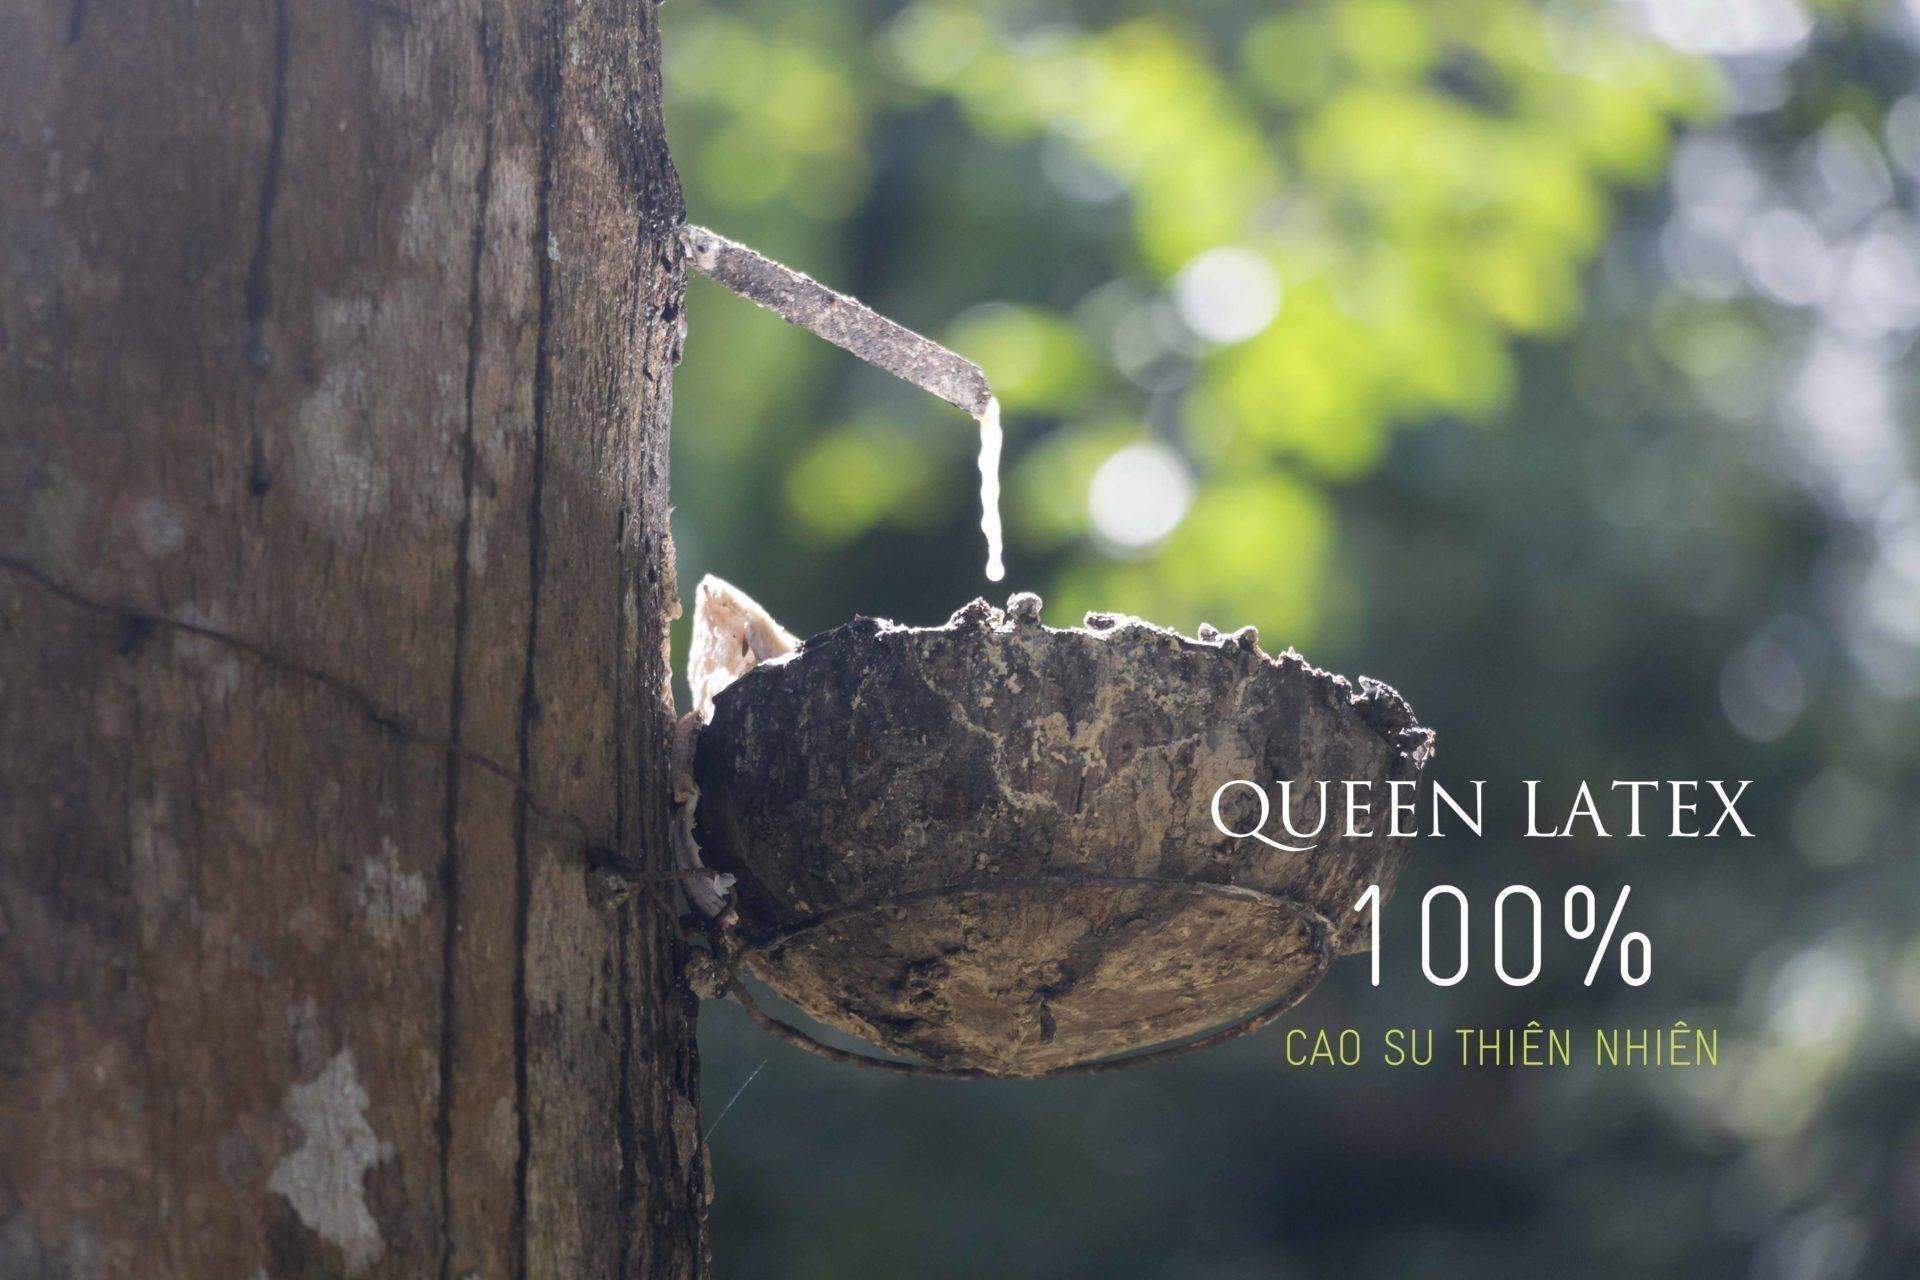 Queen latex 100% cao su thiên nhiên